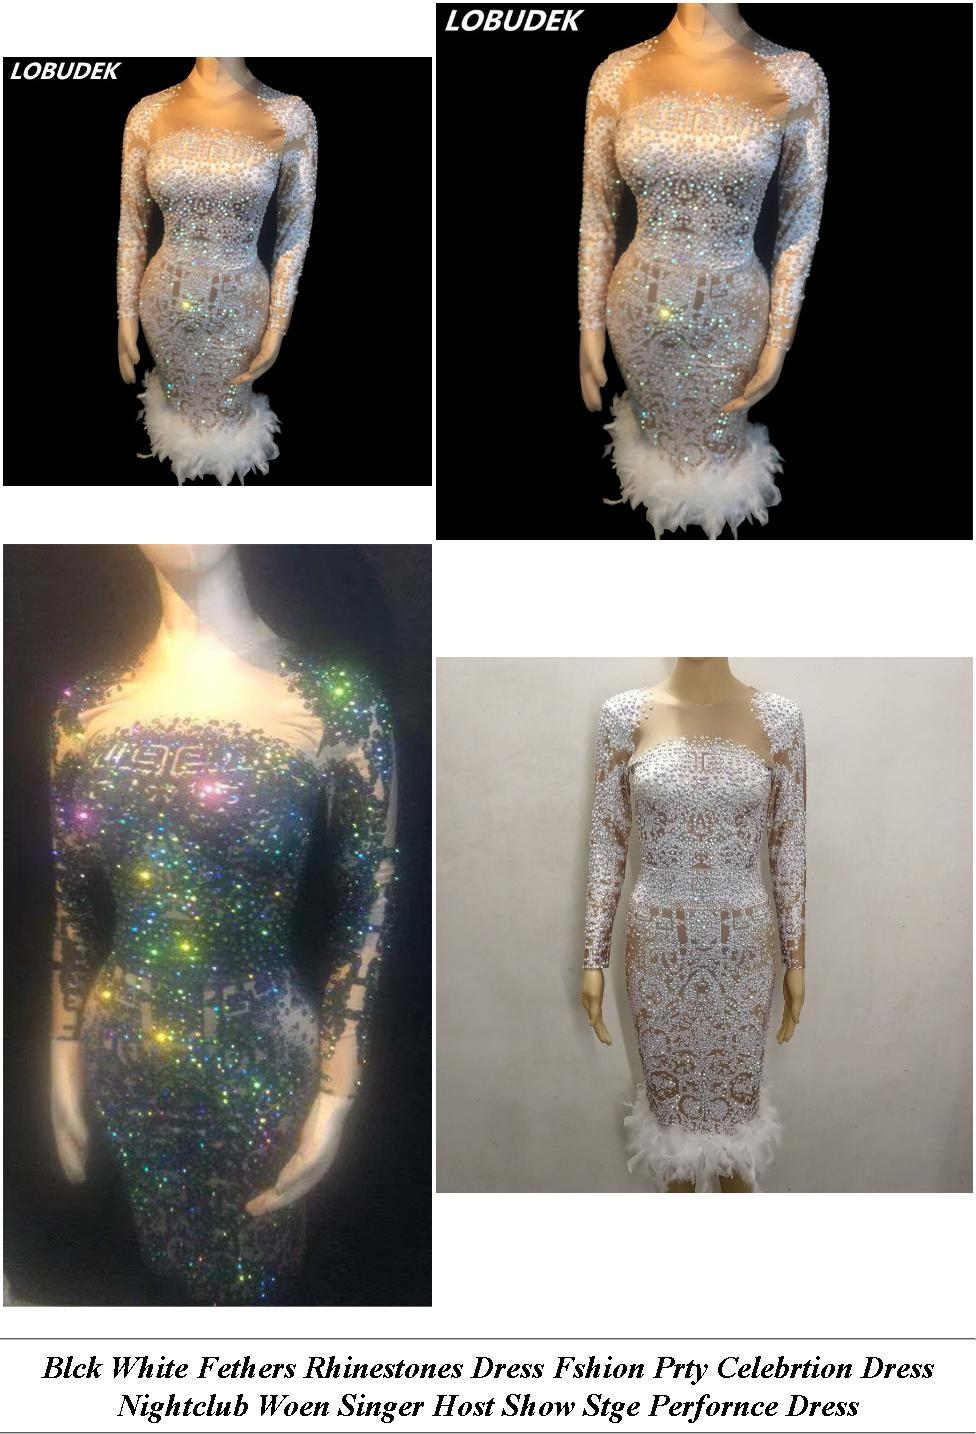 Long Lush Womens Dress - Sign Shop For Sale - Light Teal Formal Dress